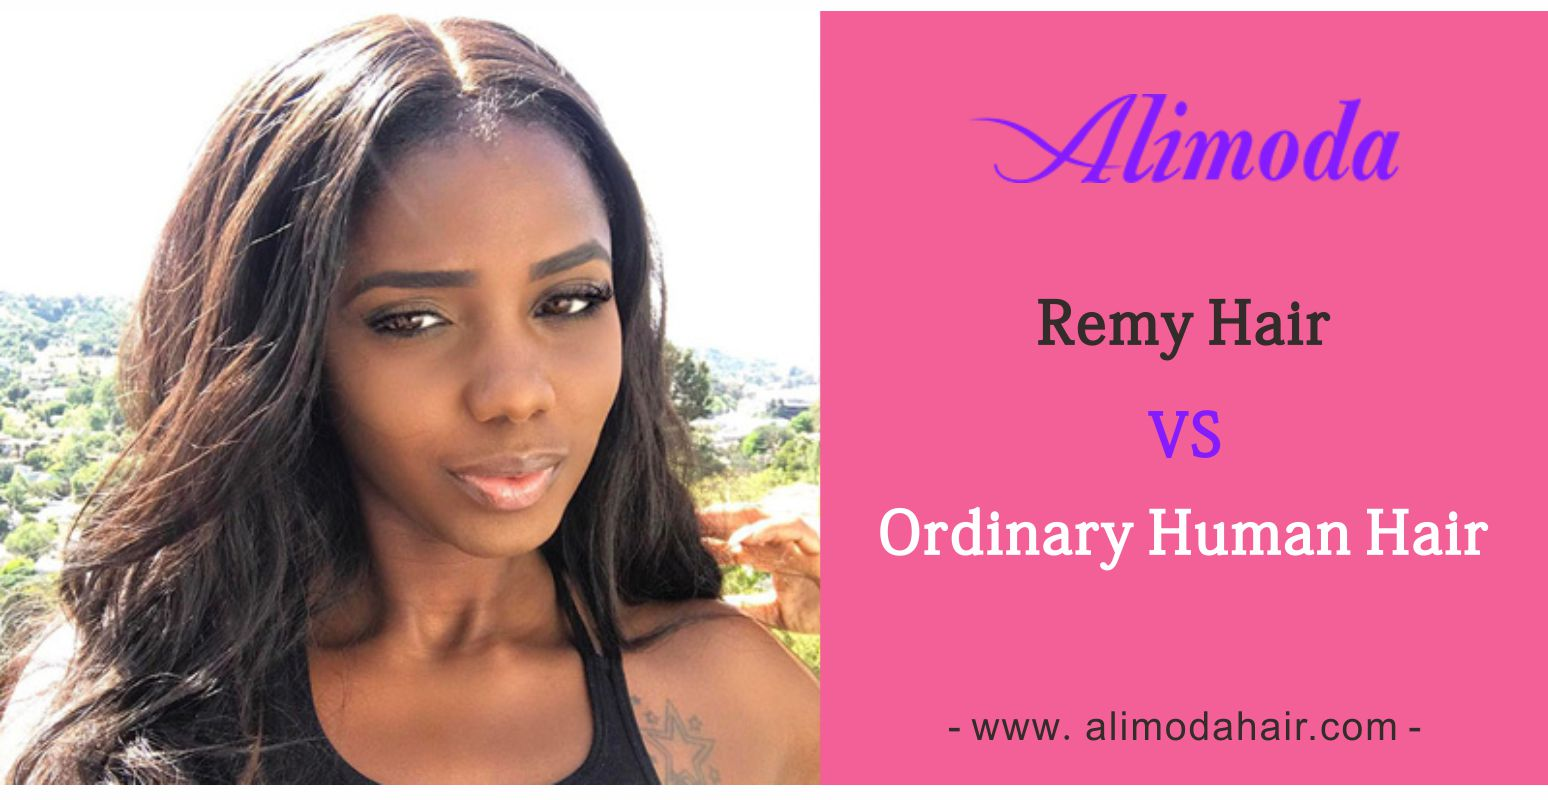 remy hair vs ordinary human hair